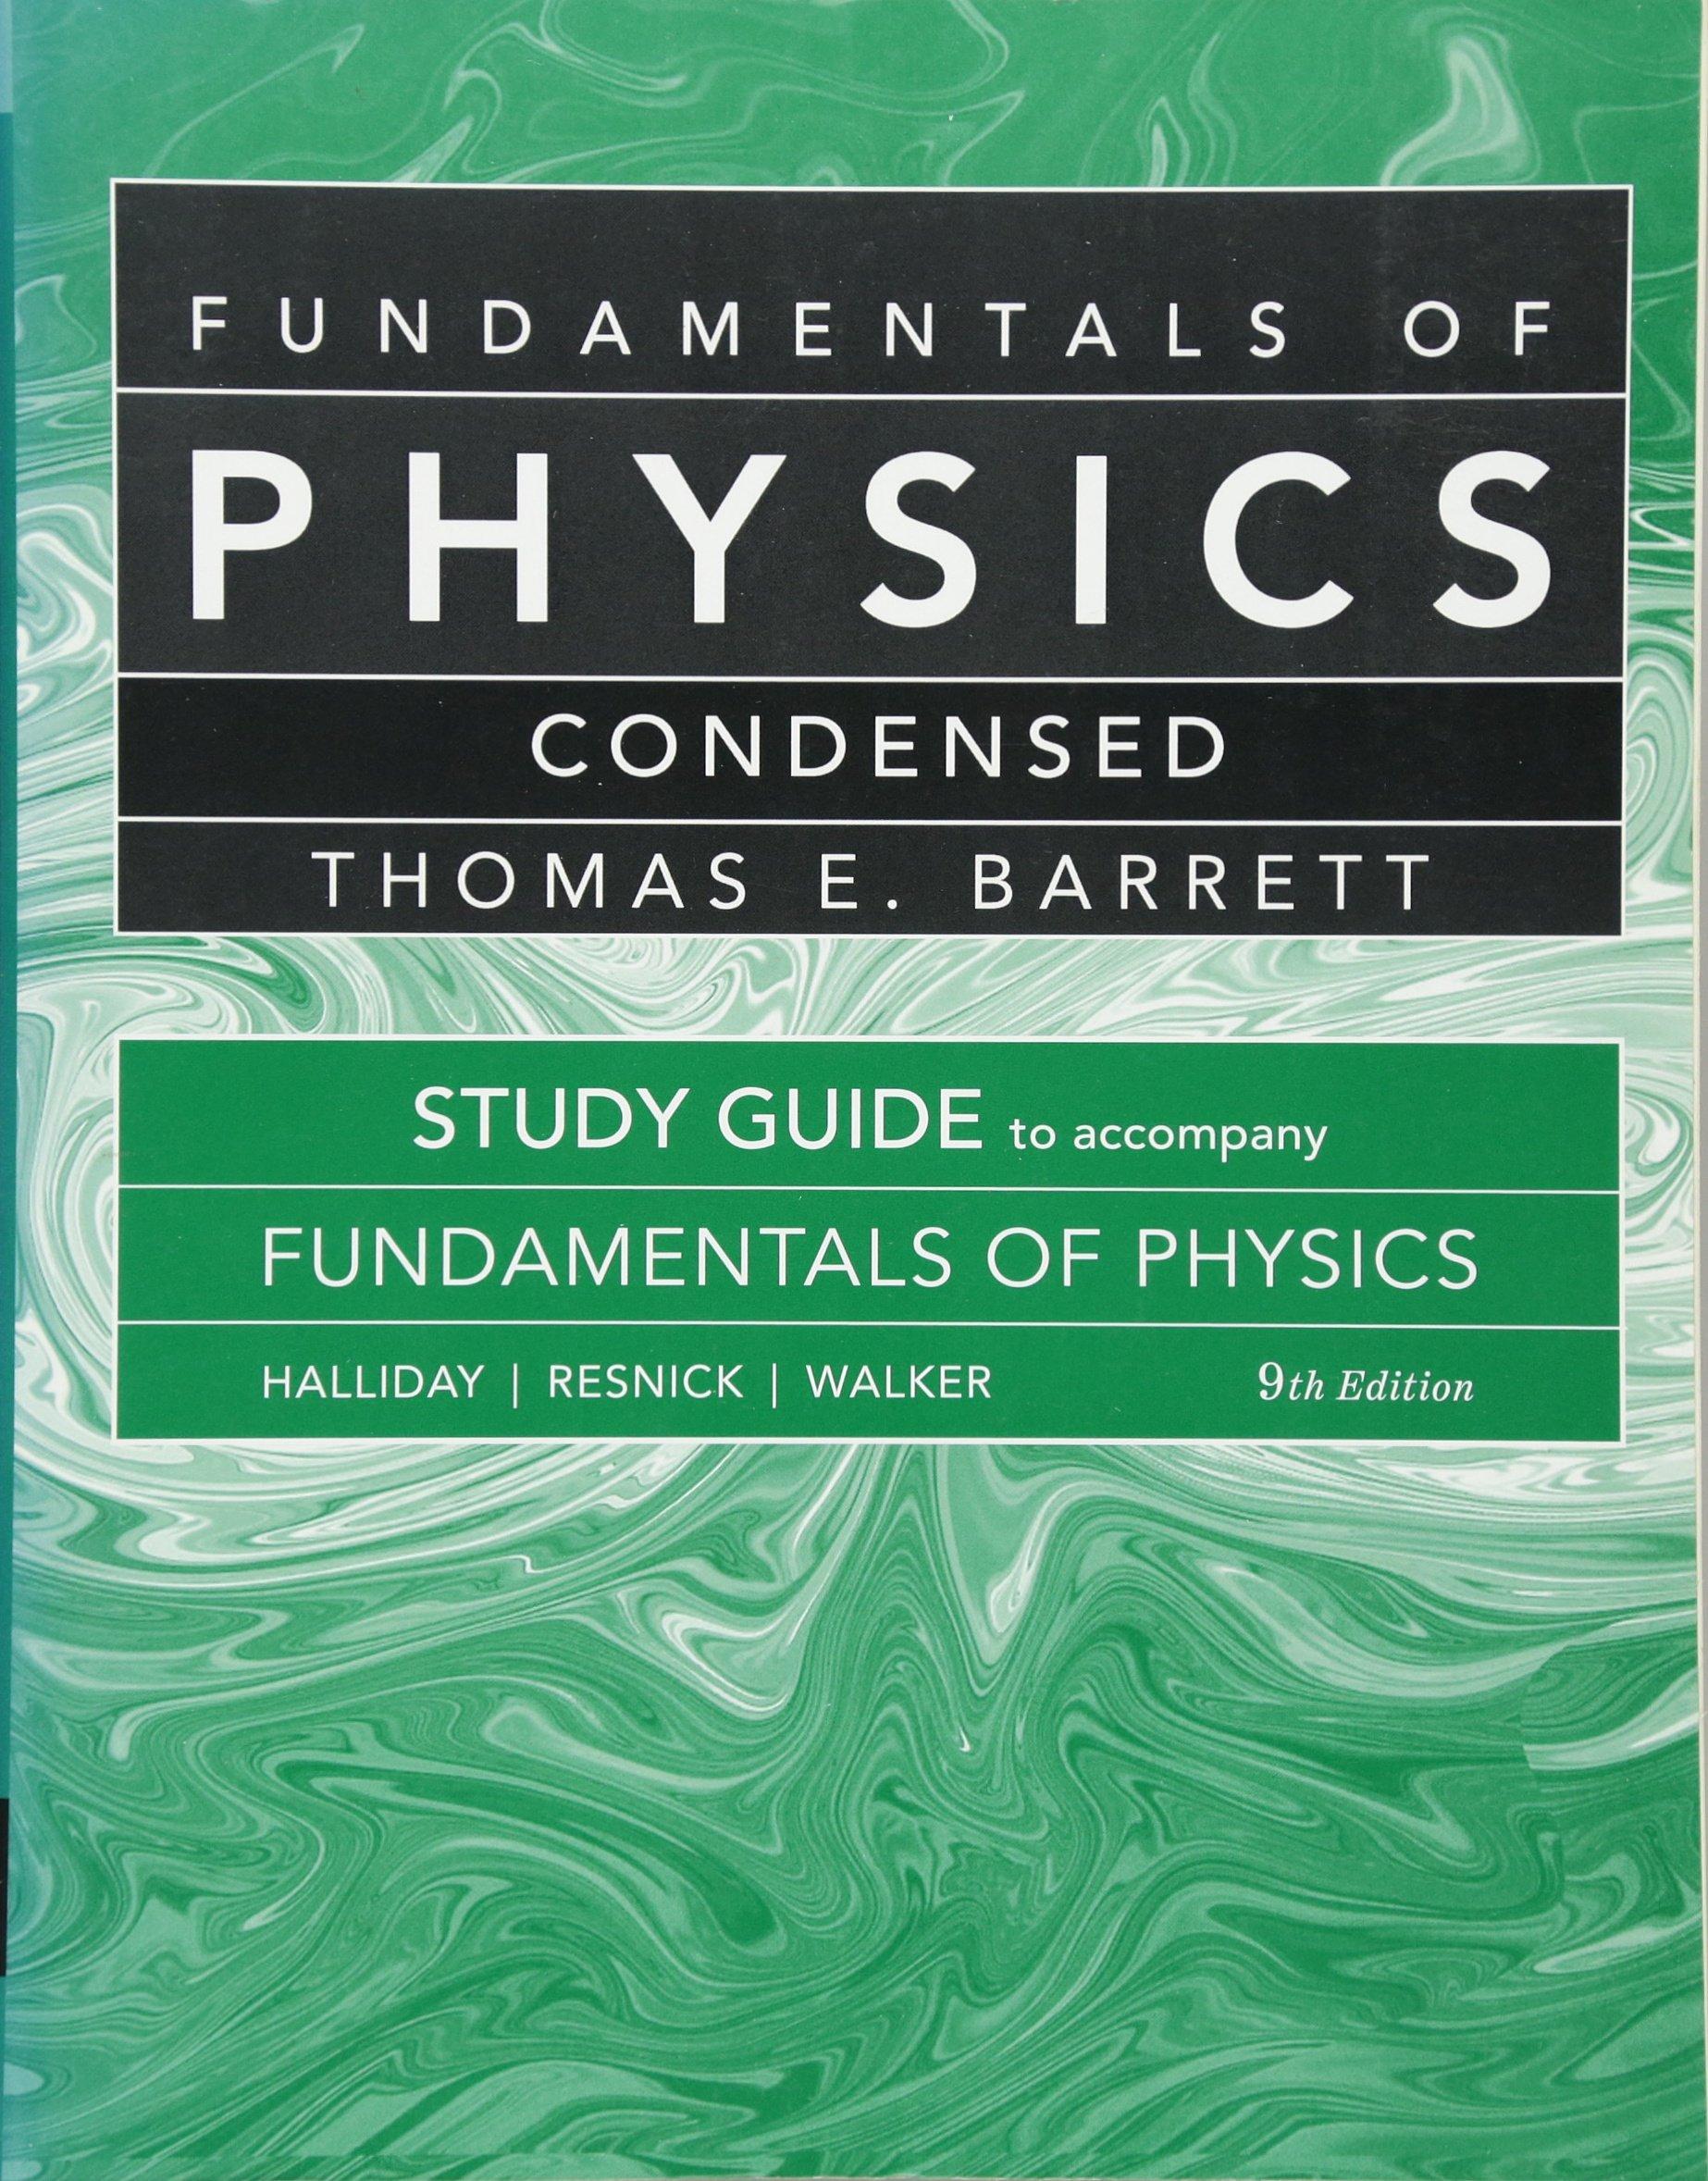 Student Study Guide for Fundamentals of Physics: David Halliday, Robert  Resnick, Jearl Walker, J. Richard Christman: 9780470551820: Books -  Amazon.ca